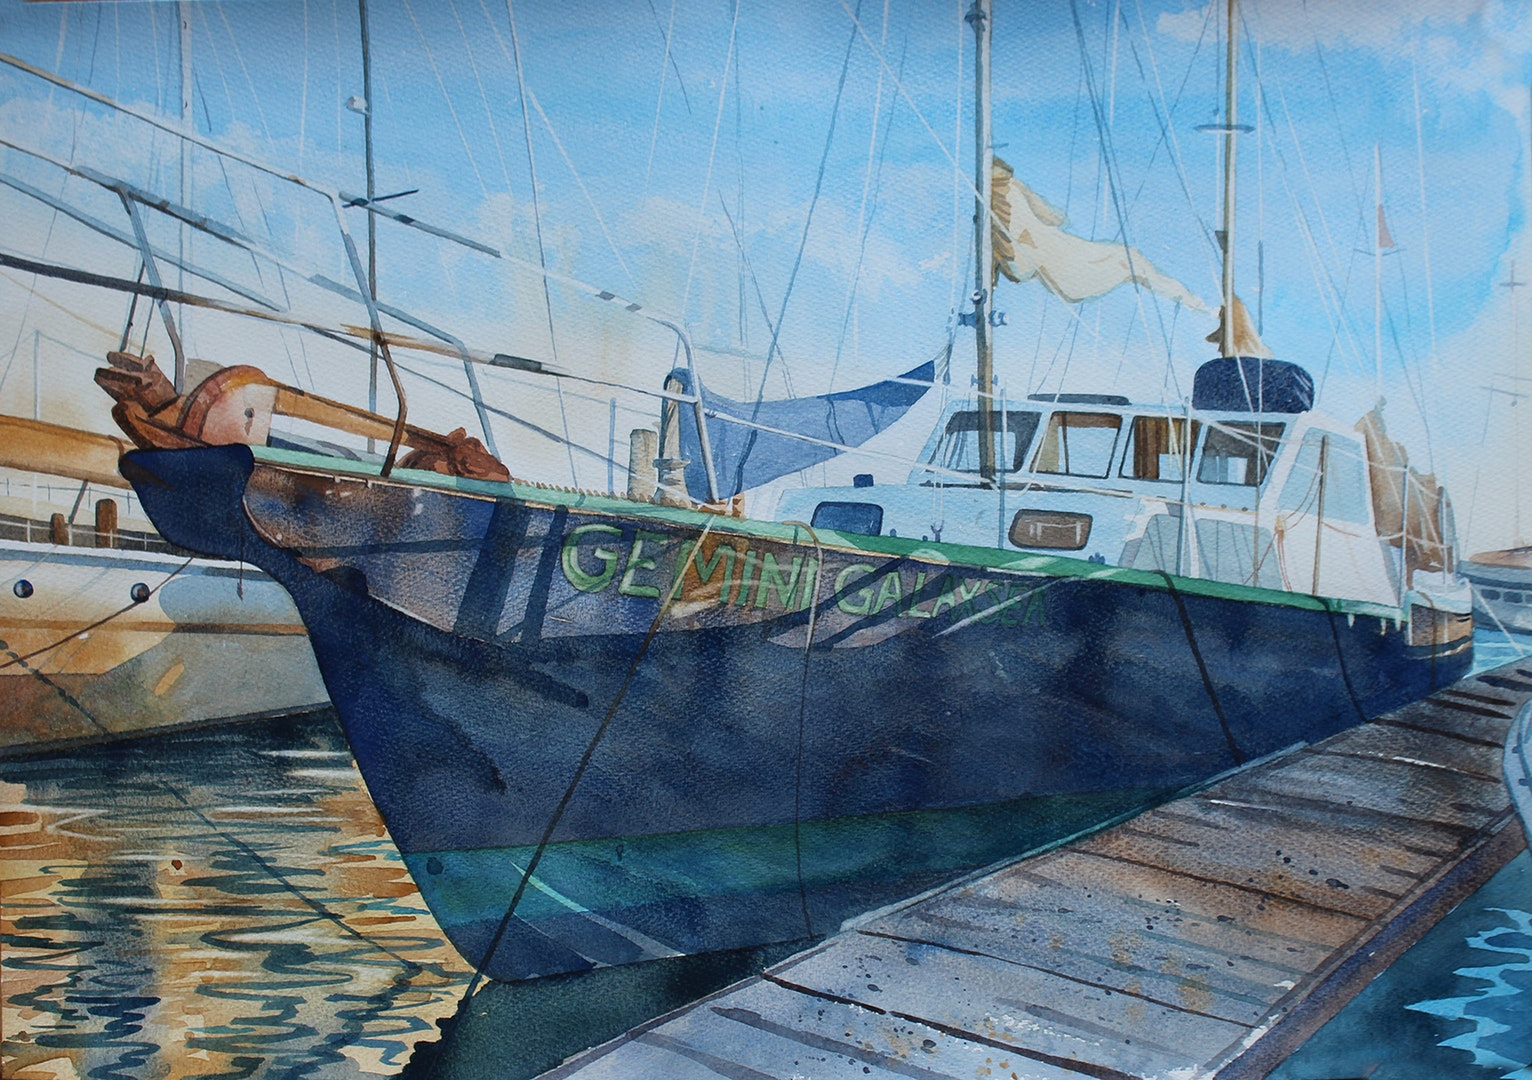 'Gemini Galaxsea', Sophie Penstone, Watercolour, 42 x 59 cm